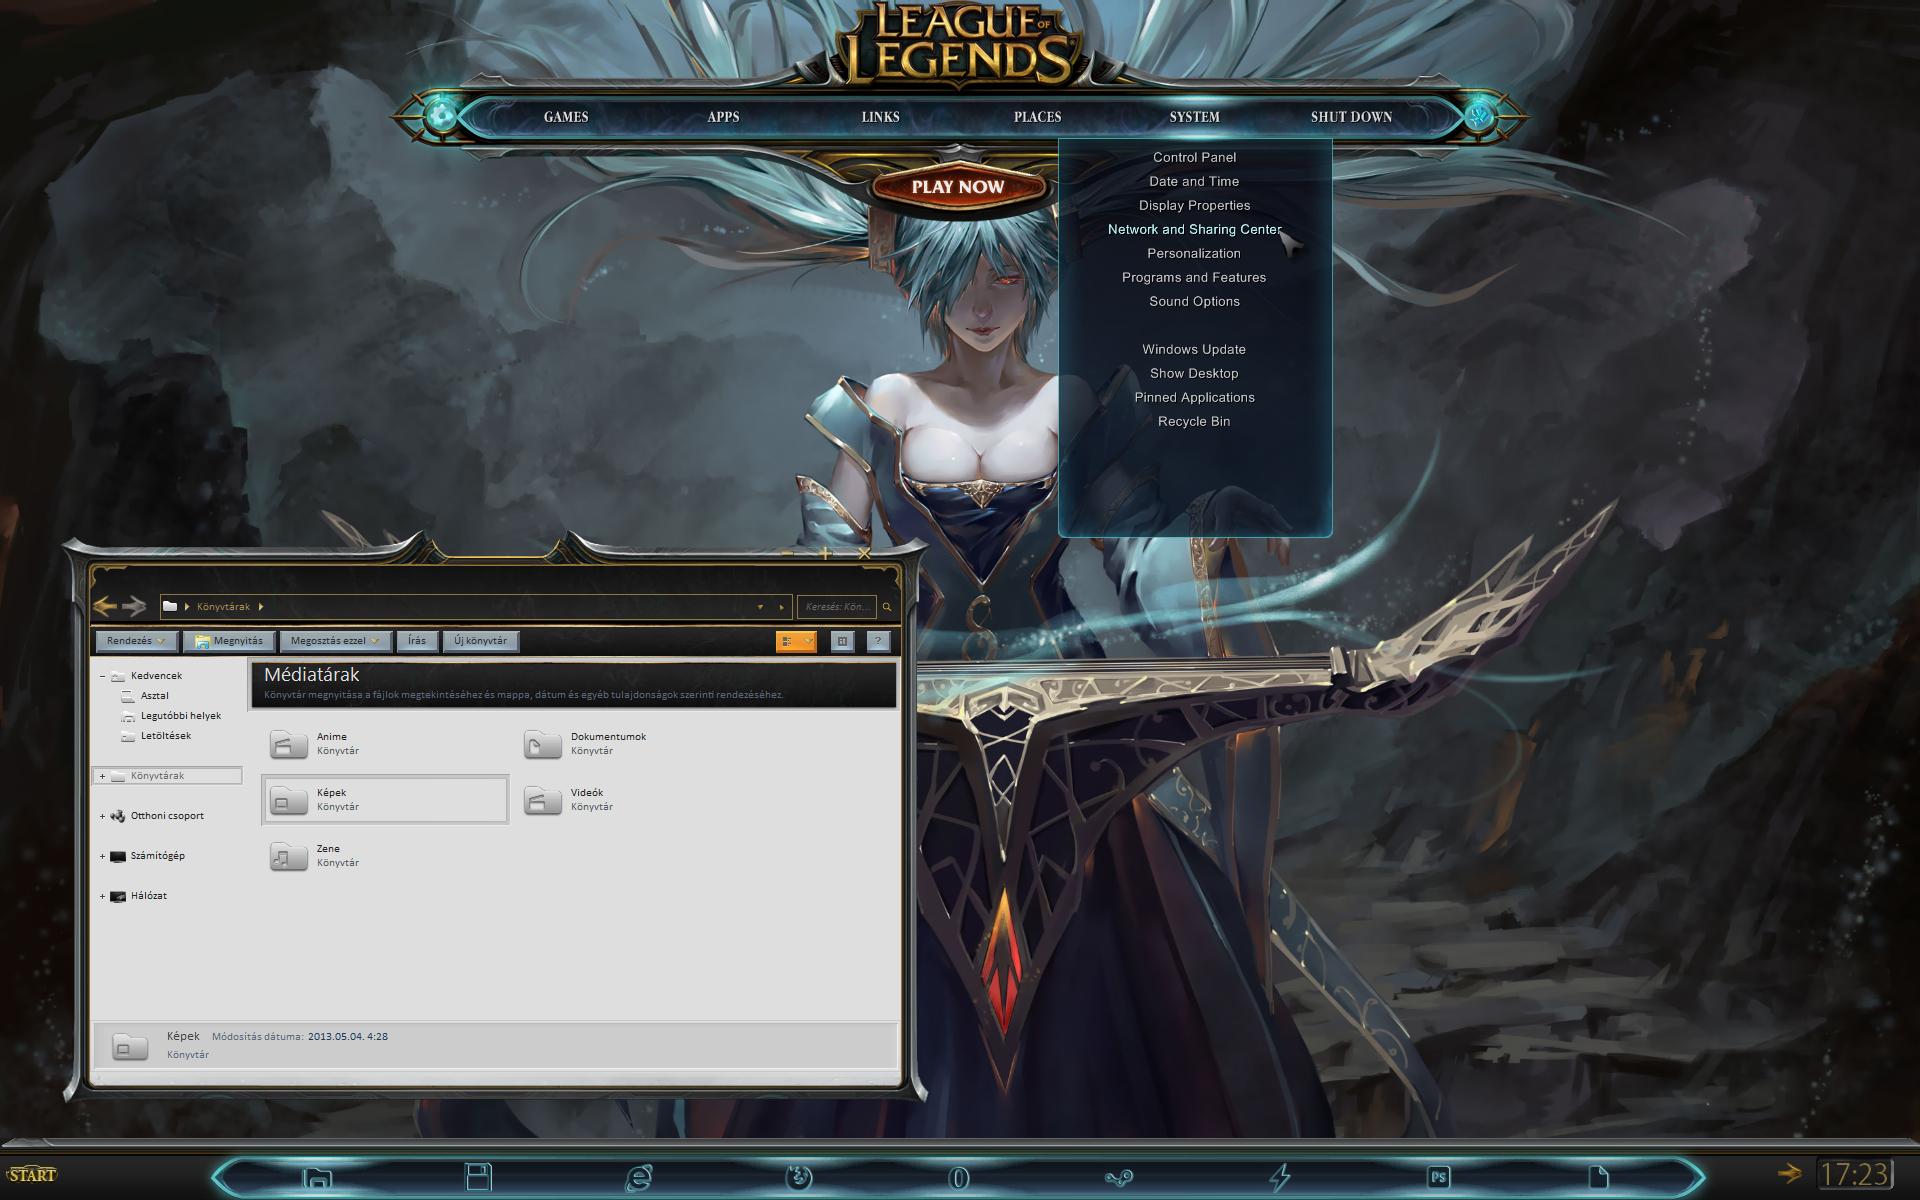 League of Legends Windows - Update! by yorgash